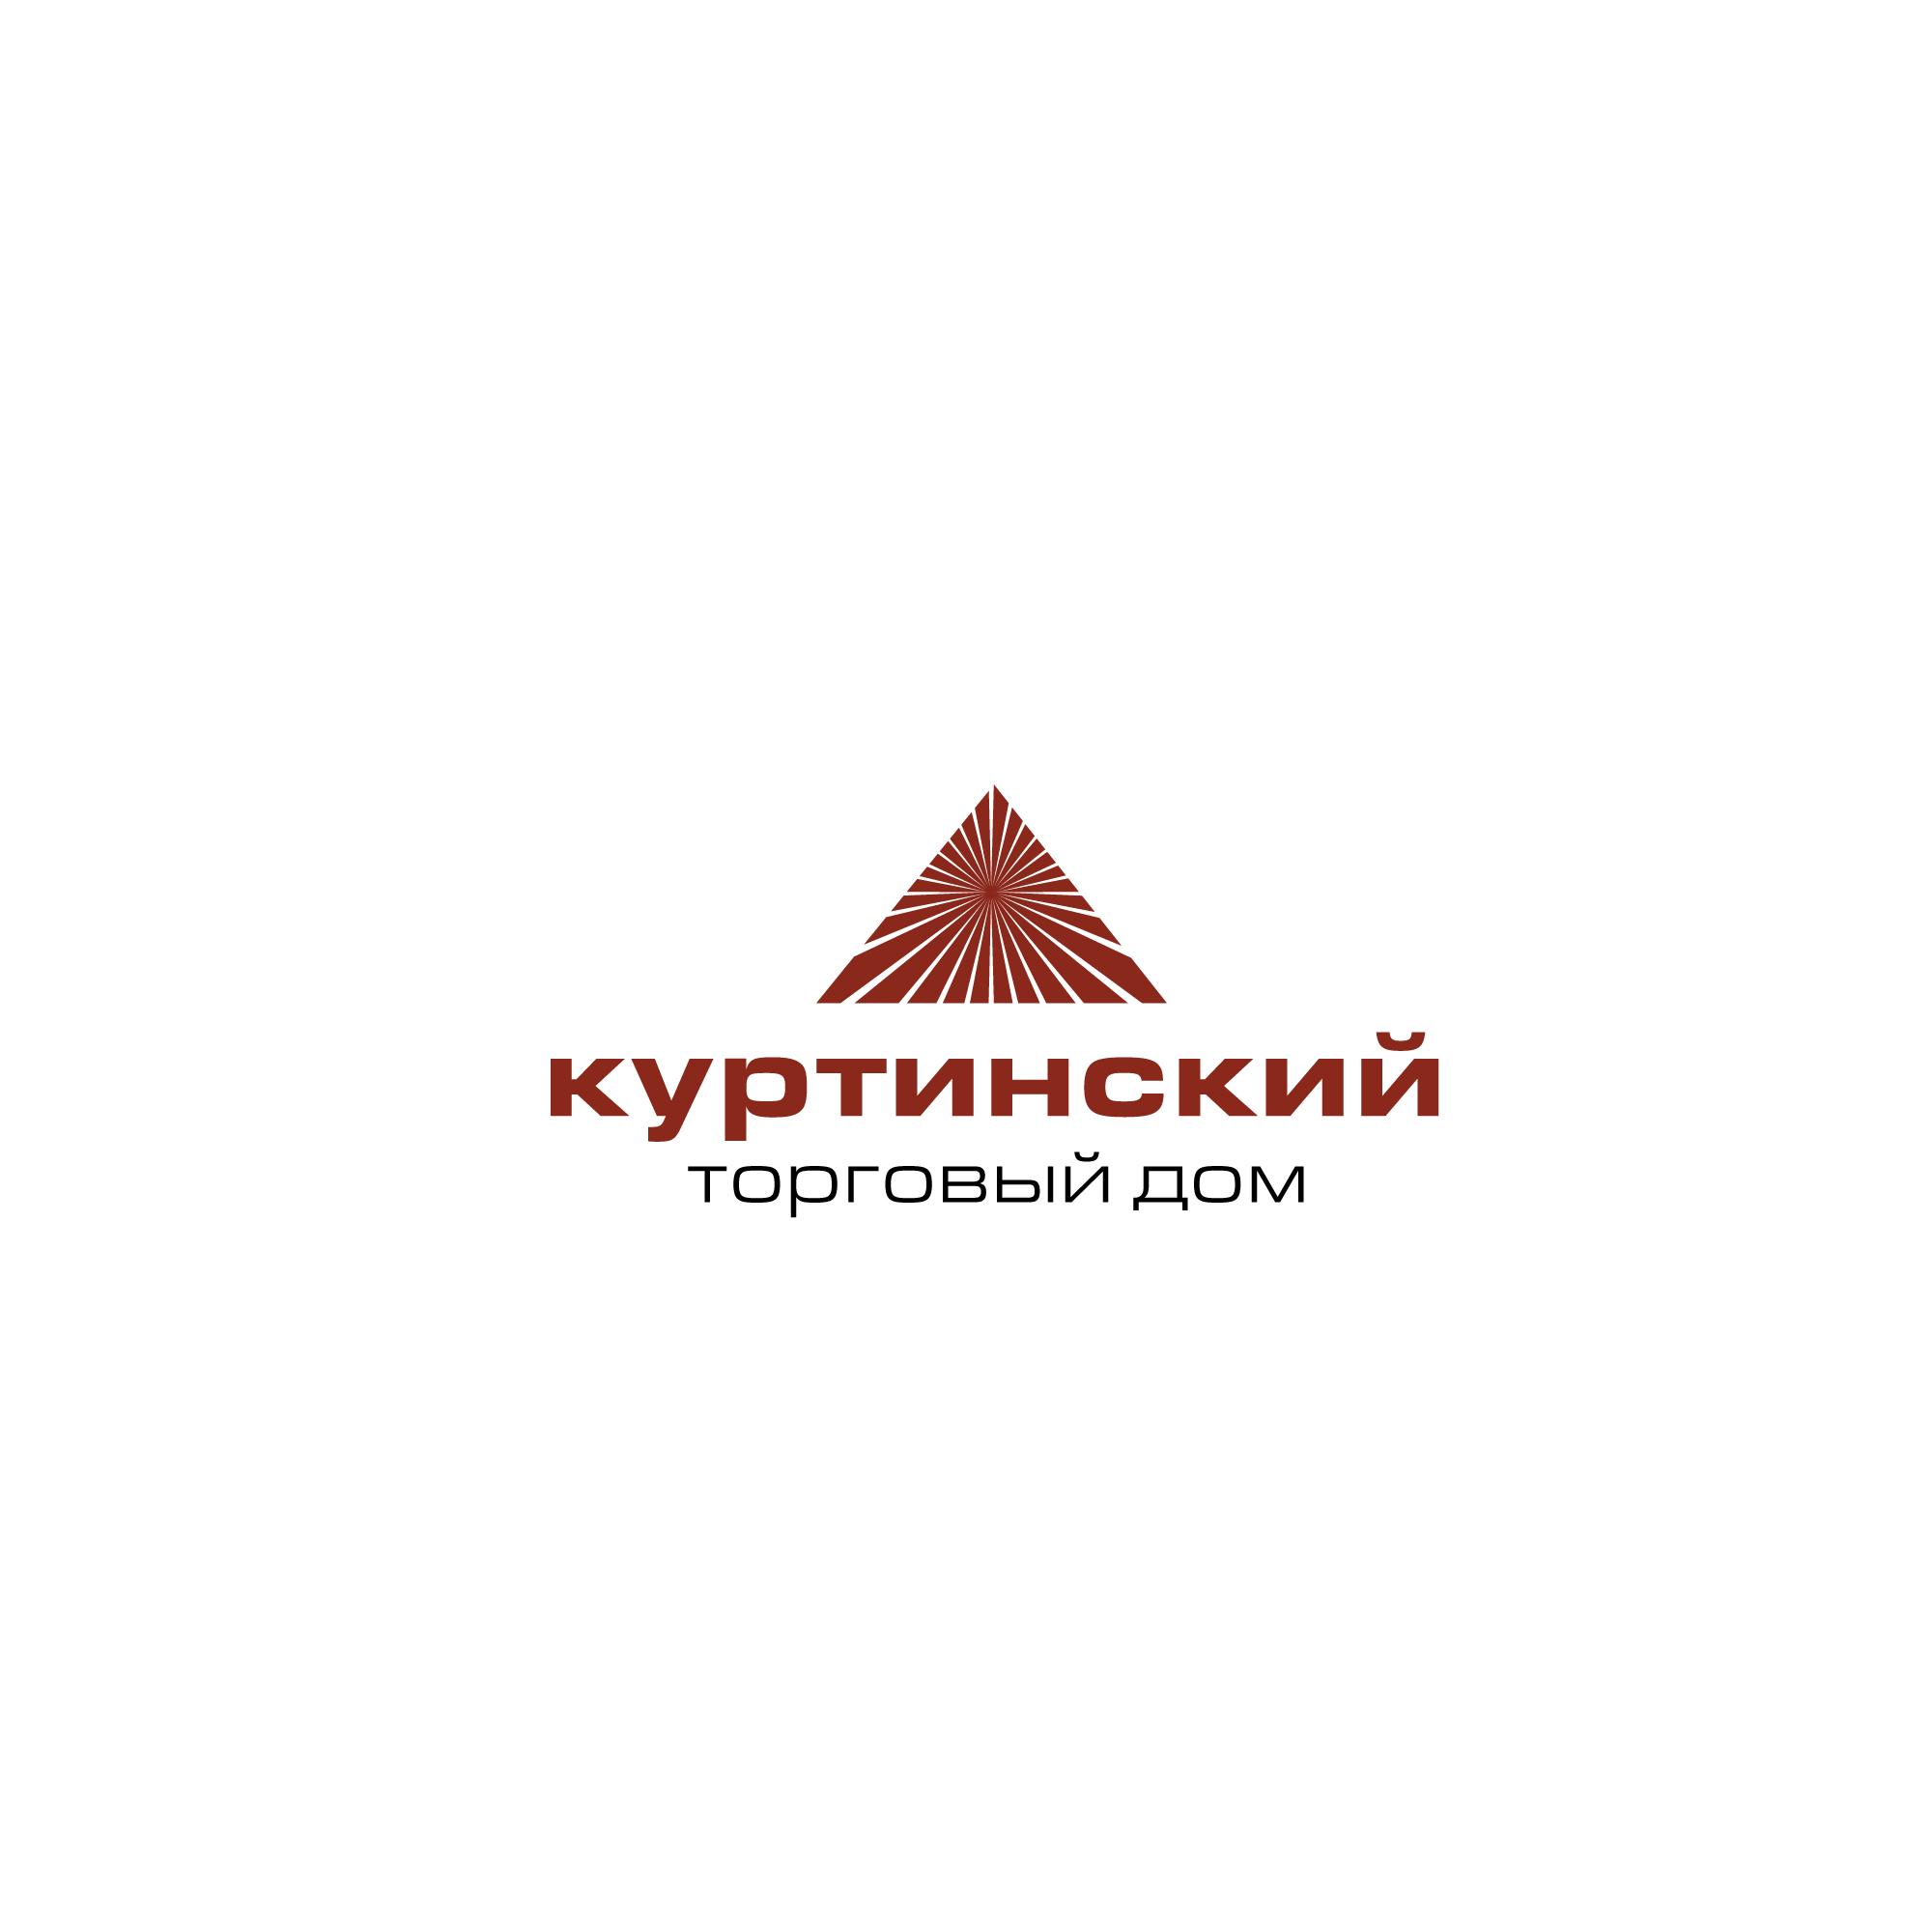 Логотип для камнедобывающей компании фото f_3135ba04594005e6.jpg